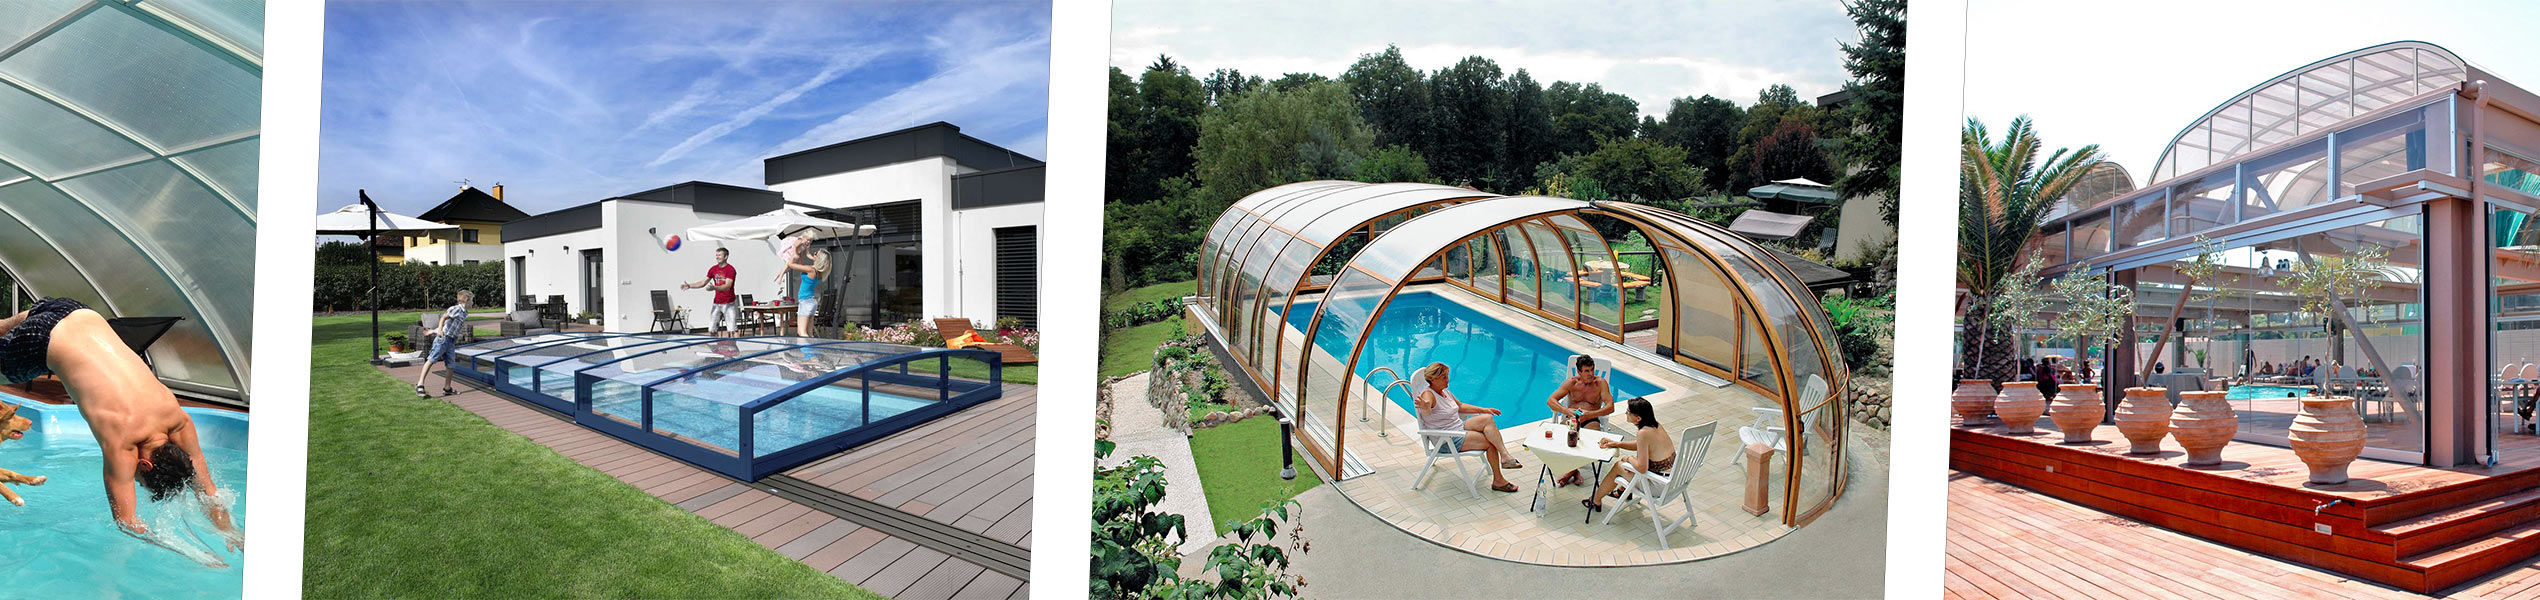 Photo gallery pool enclosure